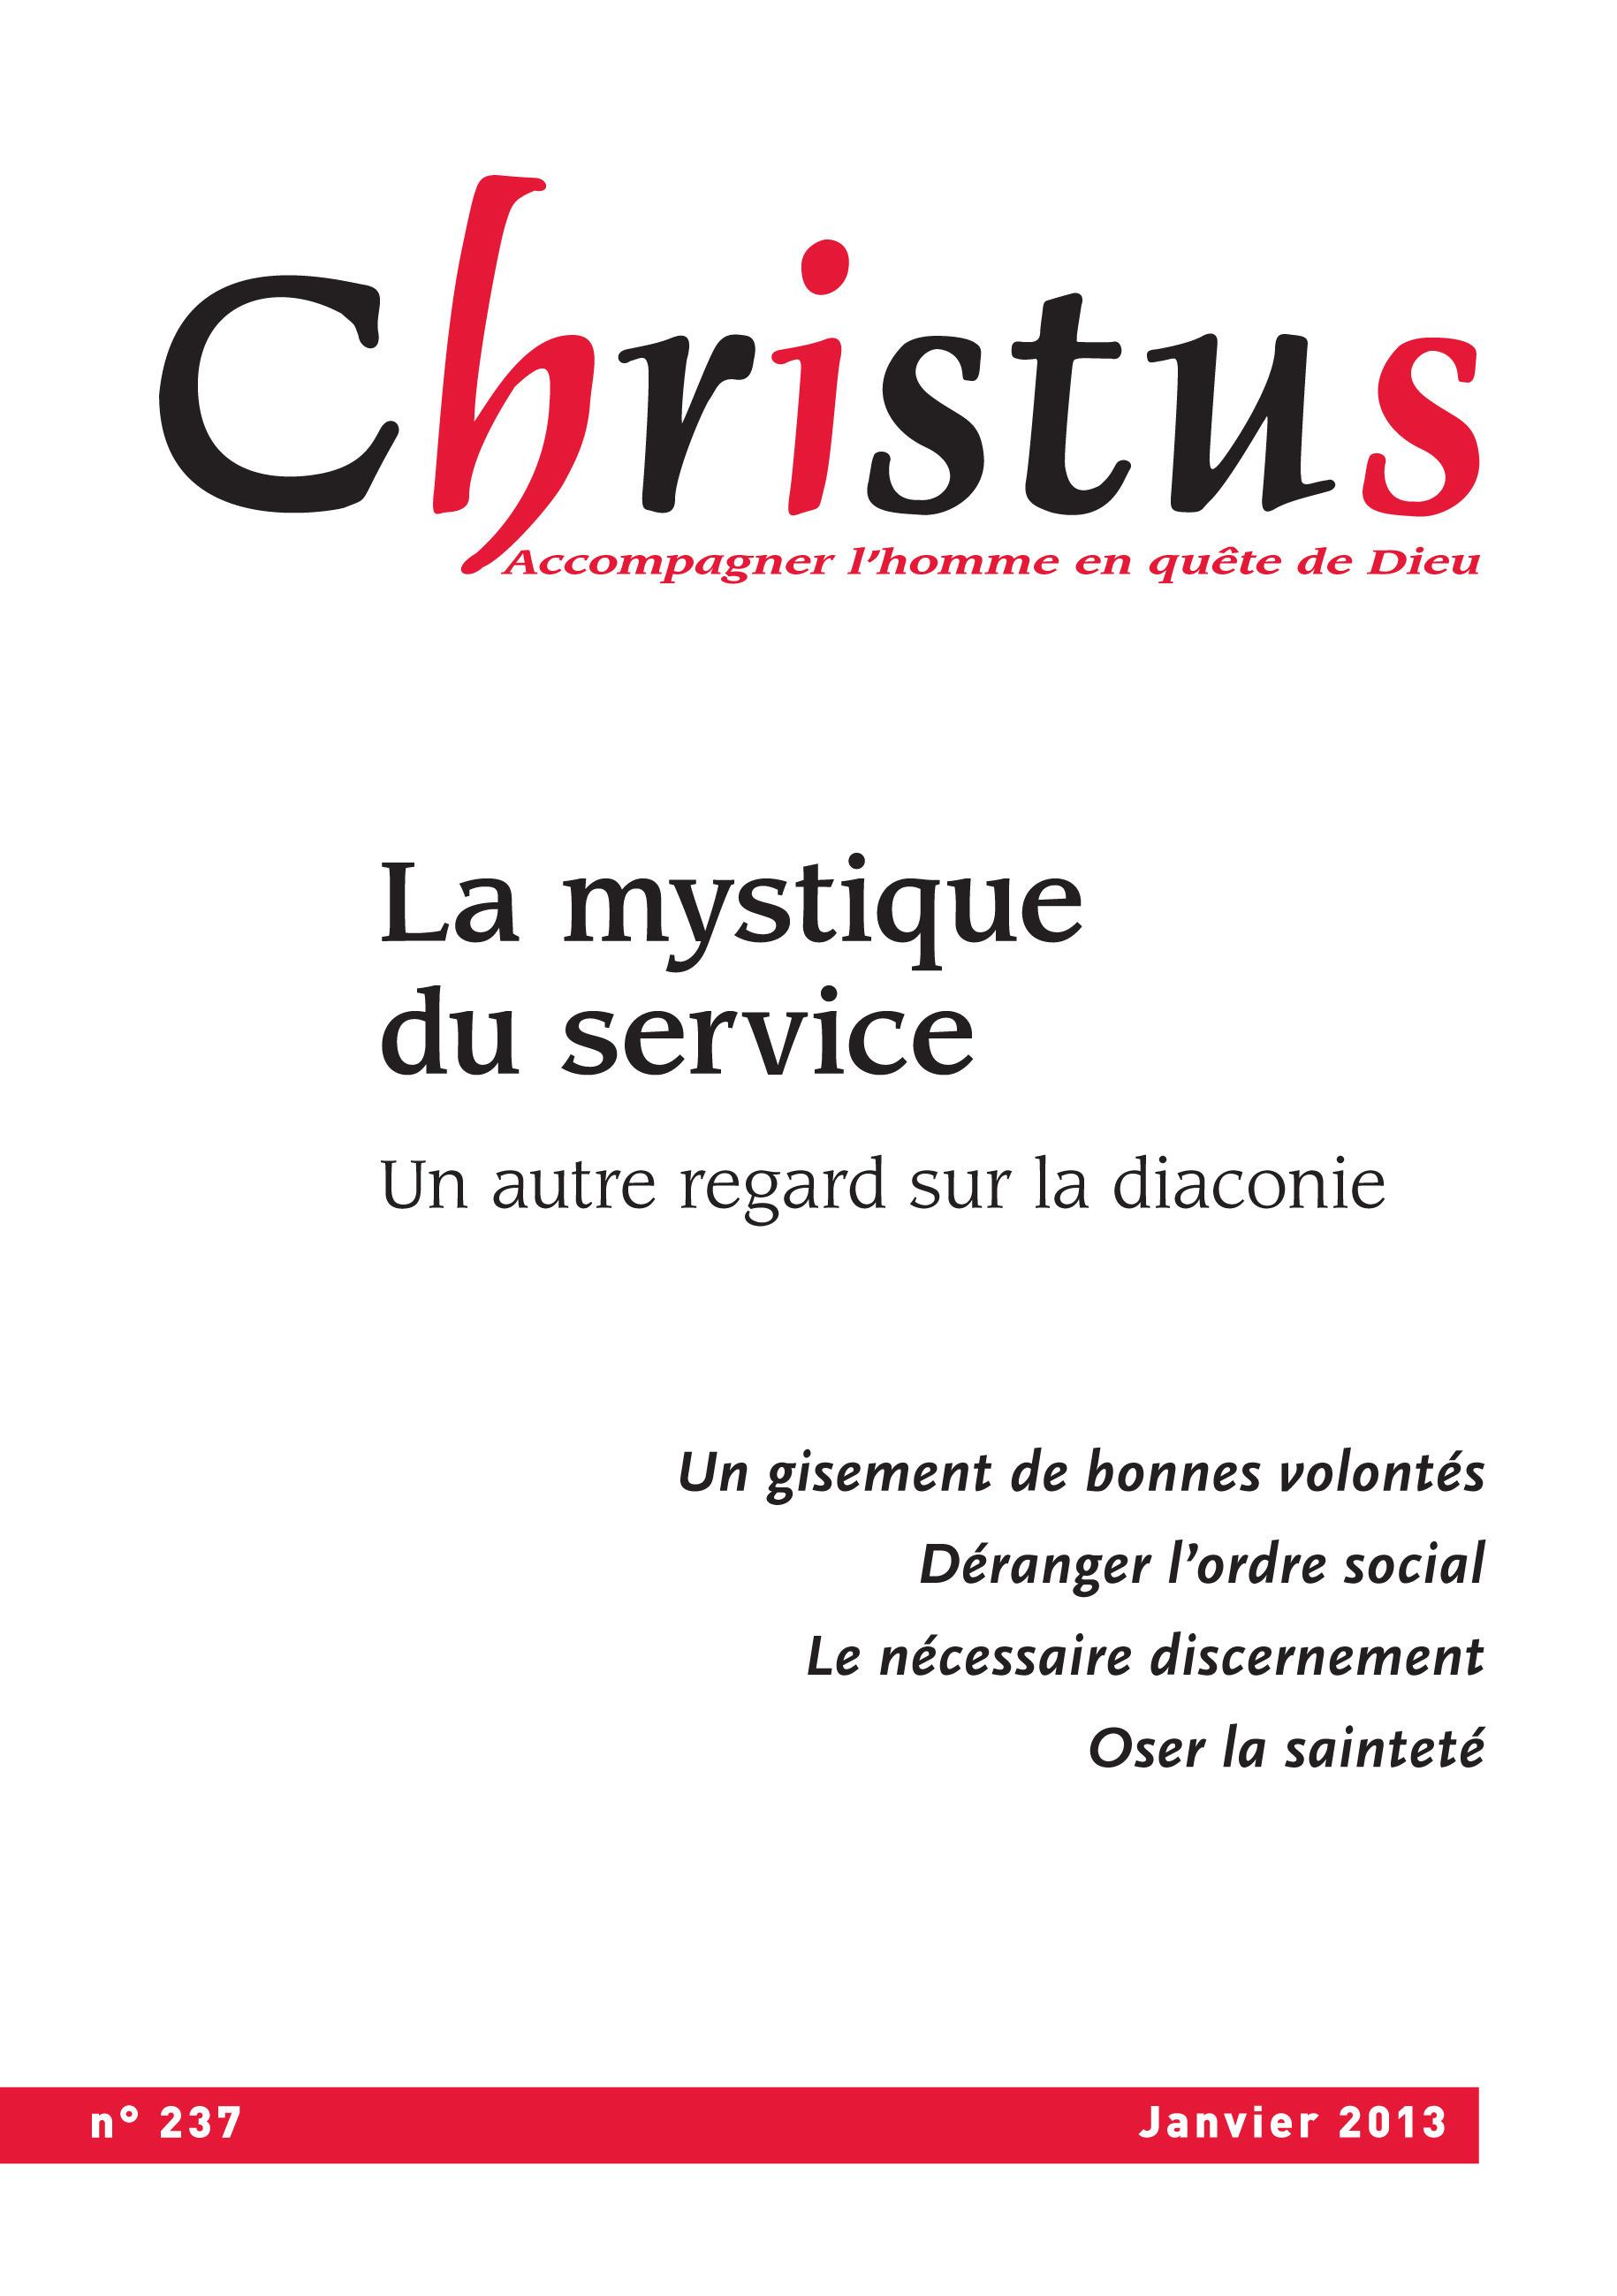 Revue christus ; Christus Janvier 2013 - N°237